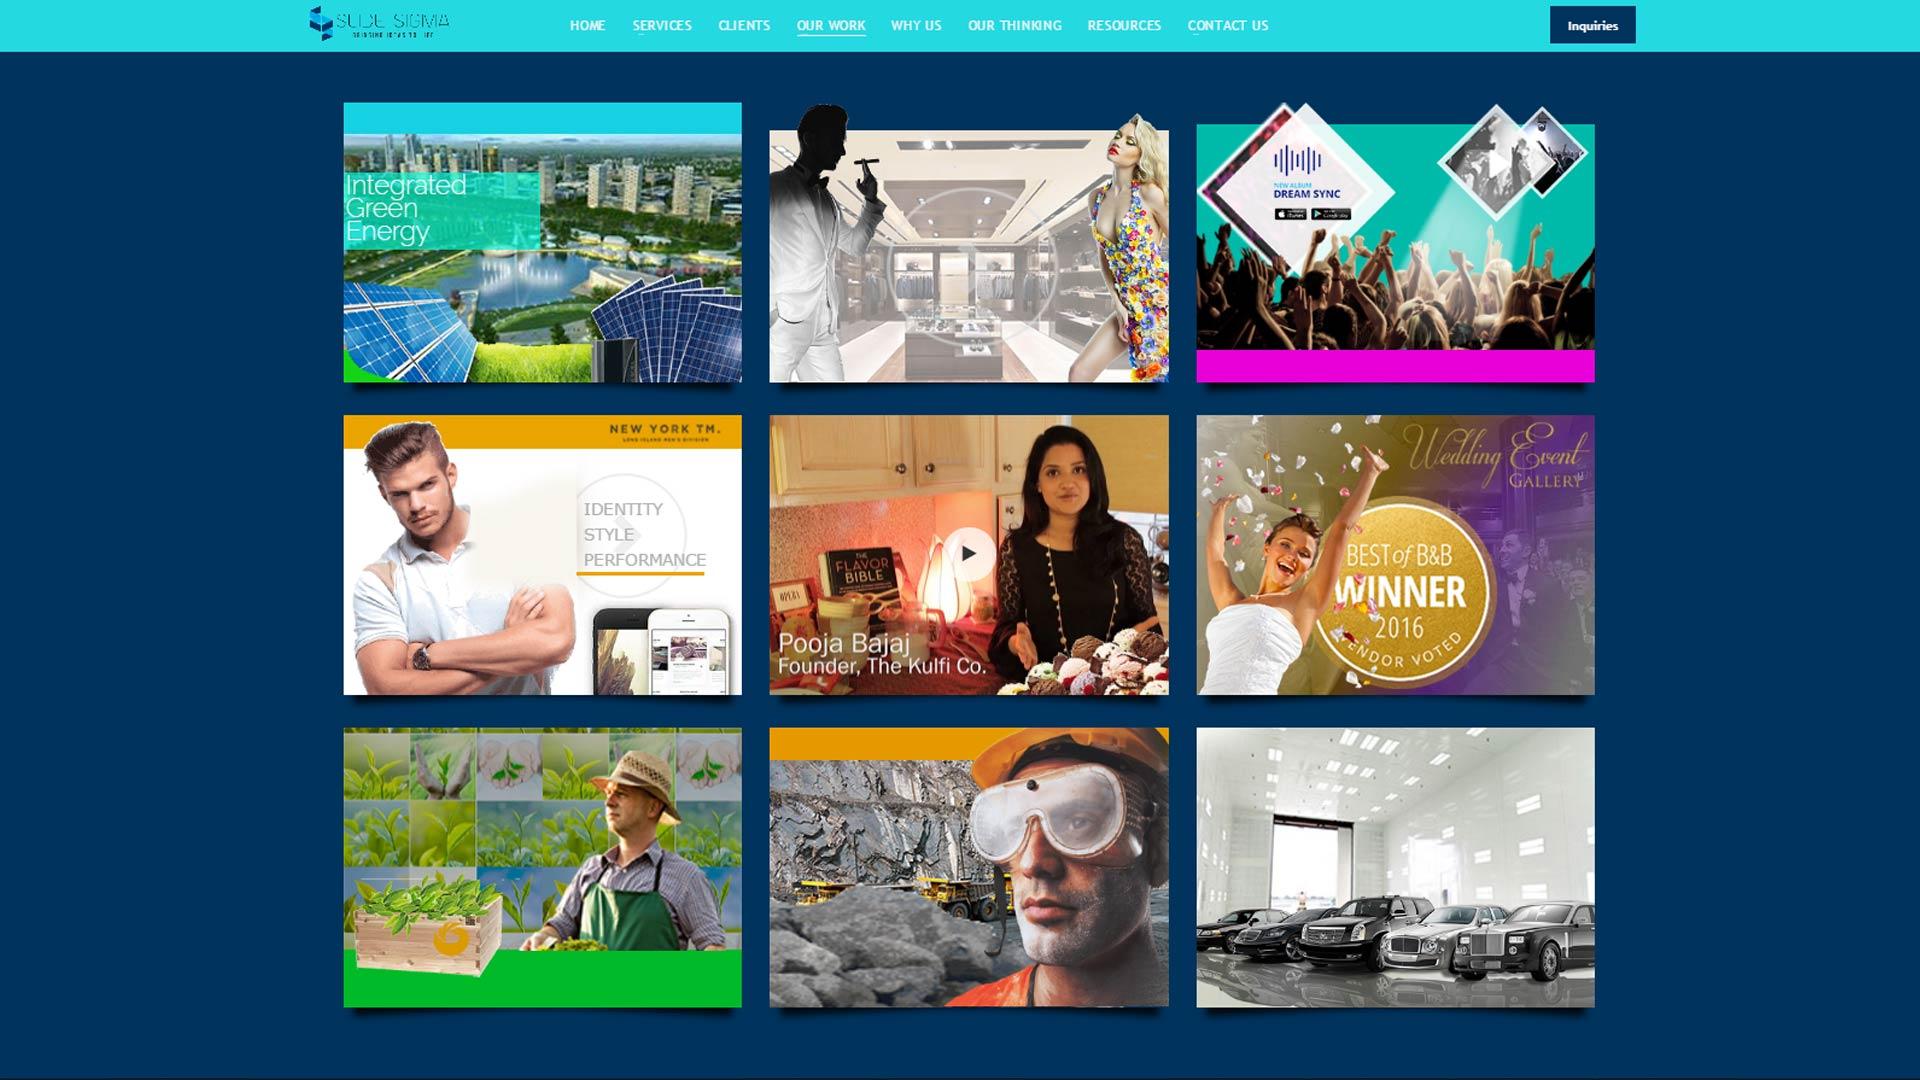 Website Design Portfolio by Slidesigma a new York based agency